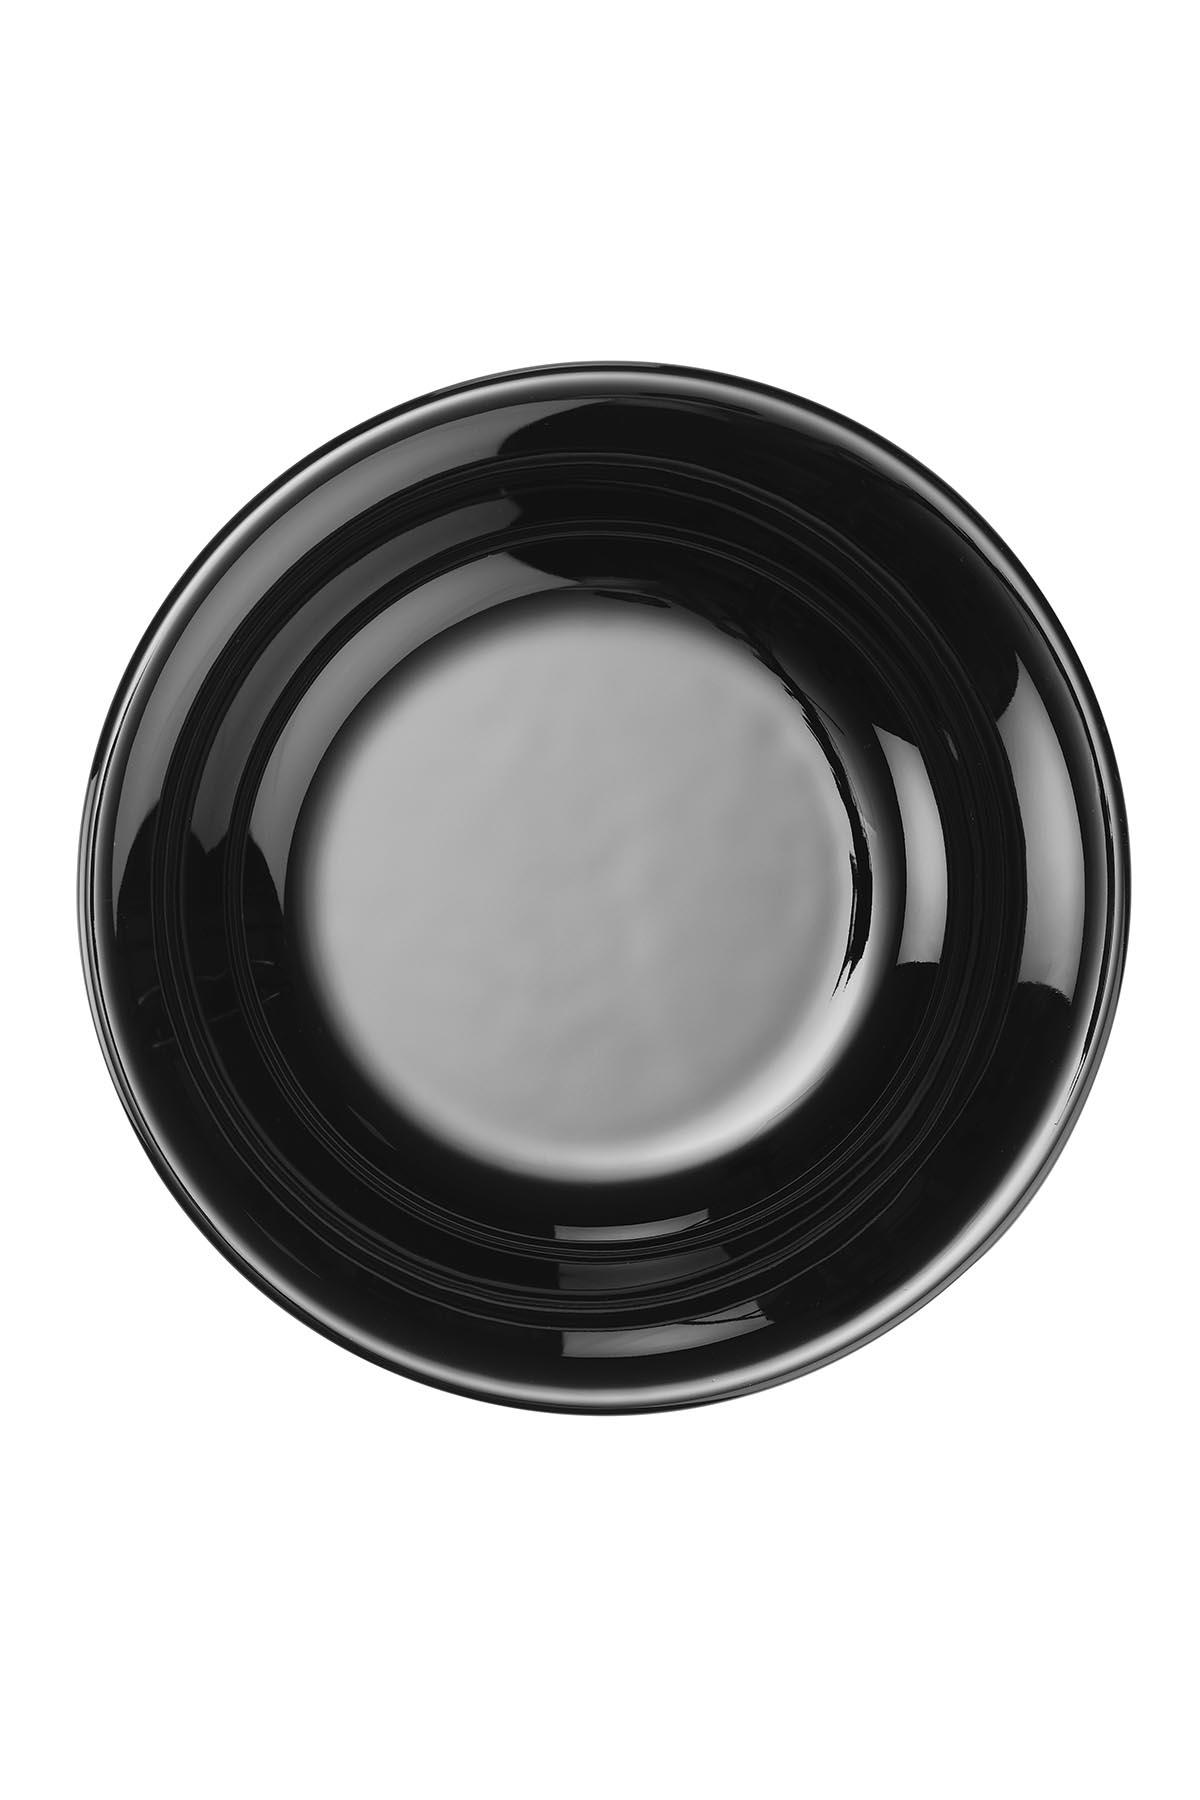 Kütahya Porselen Nanoceram 24 Parça Yemek Seti 89074